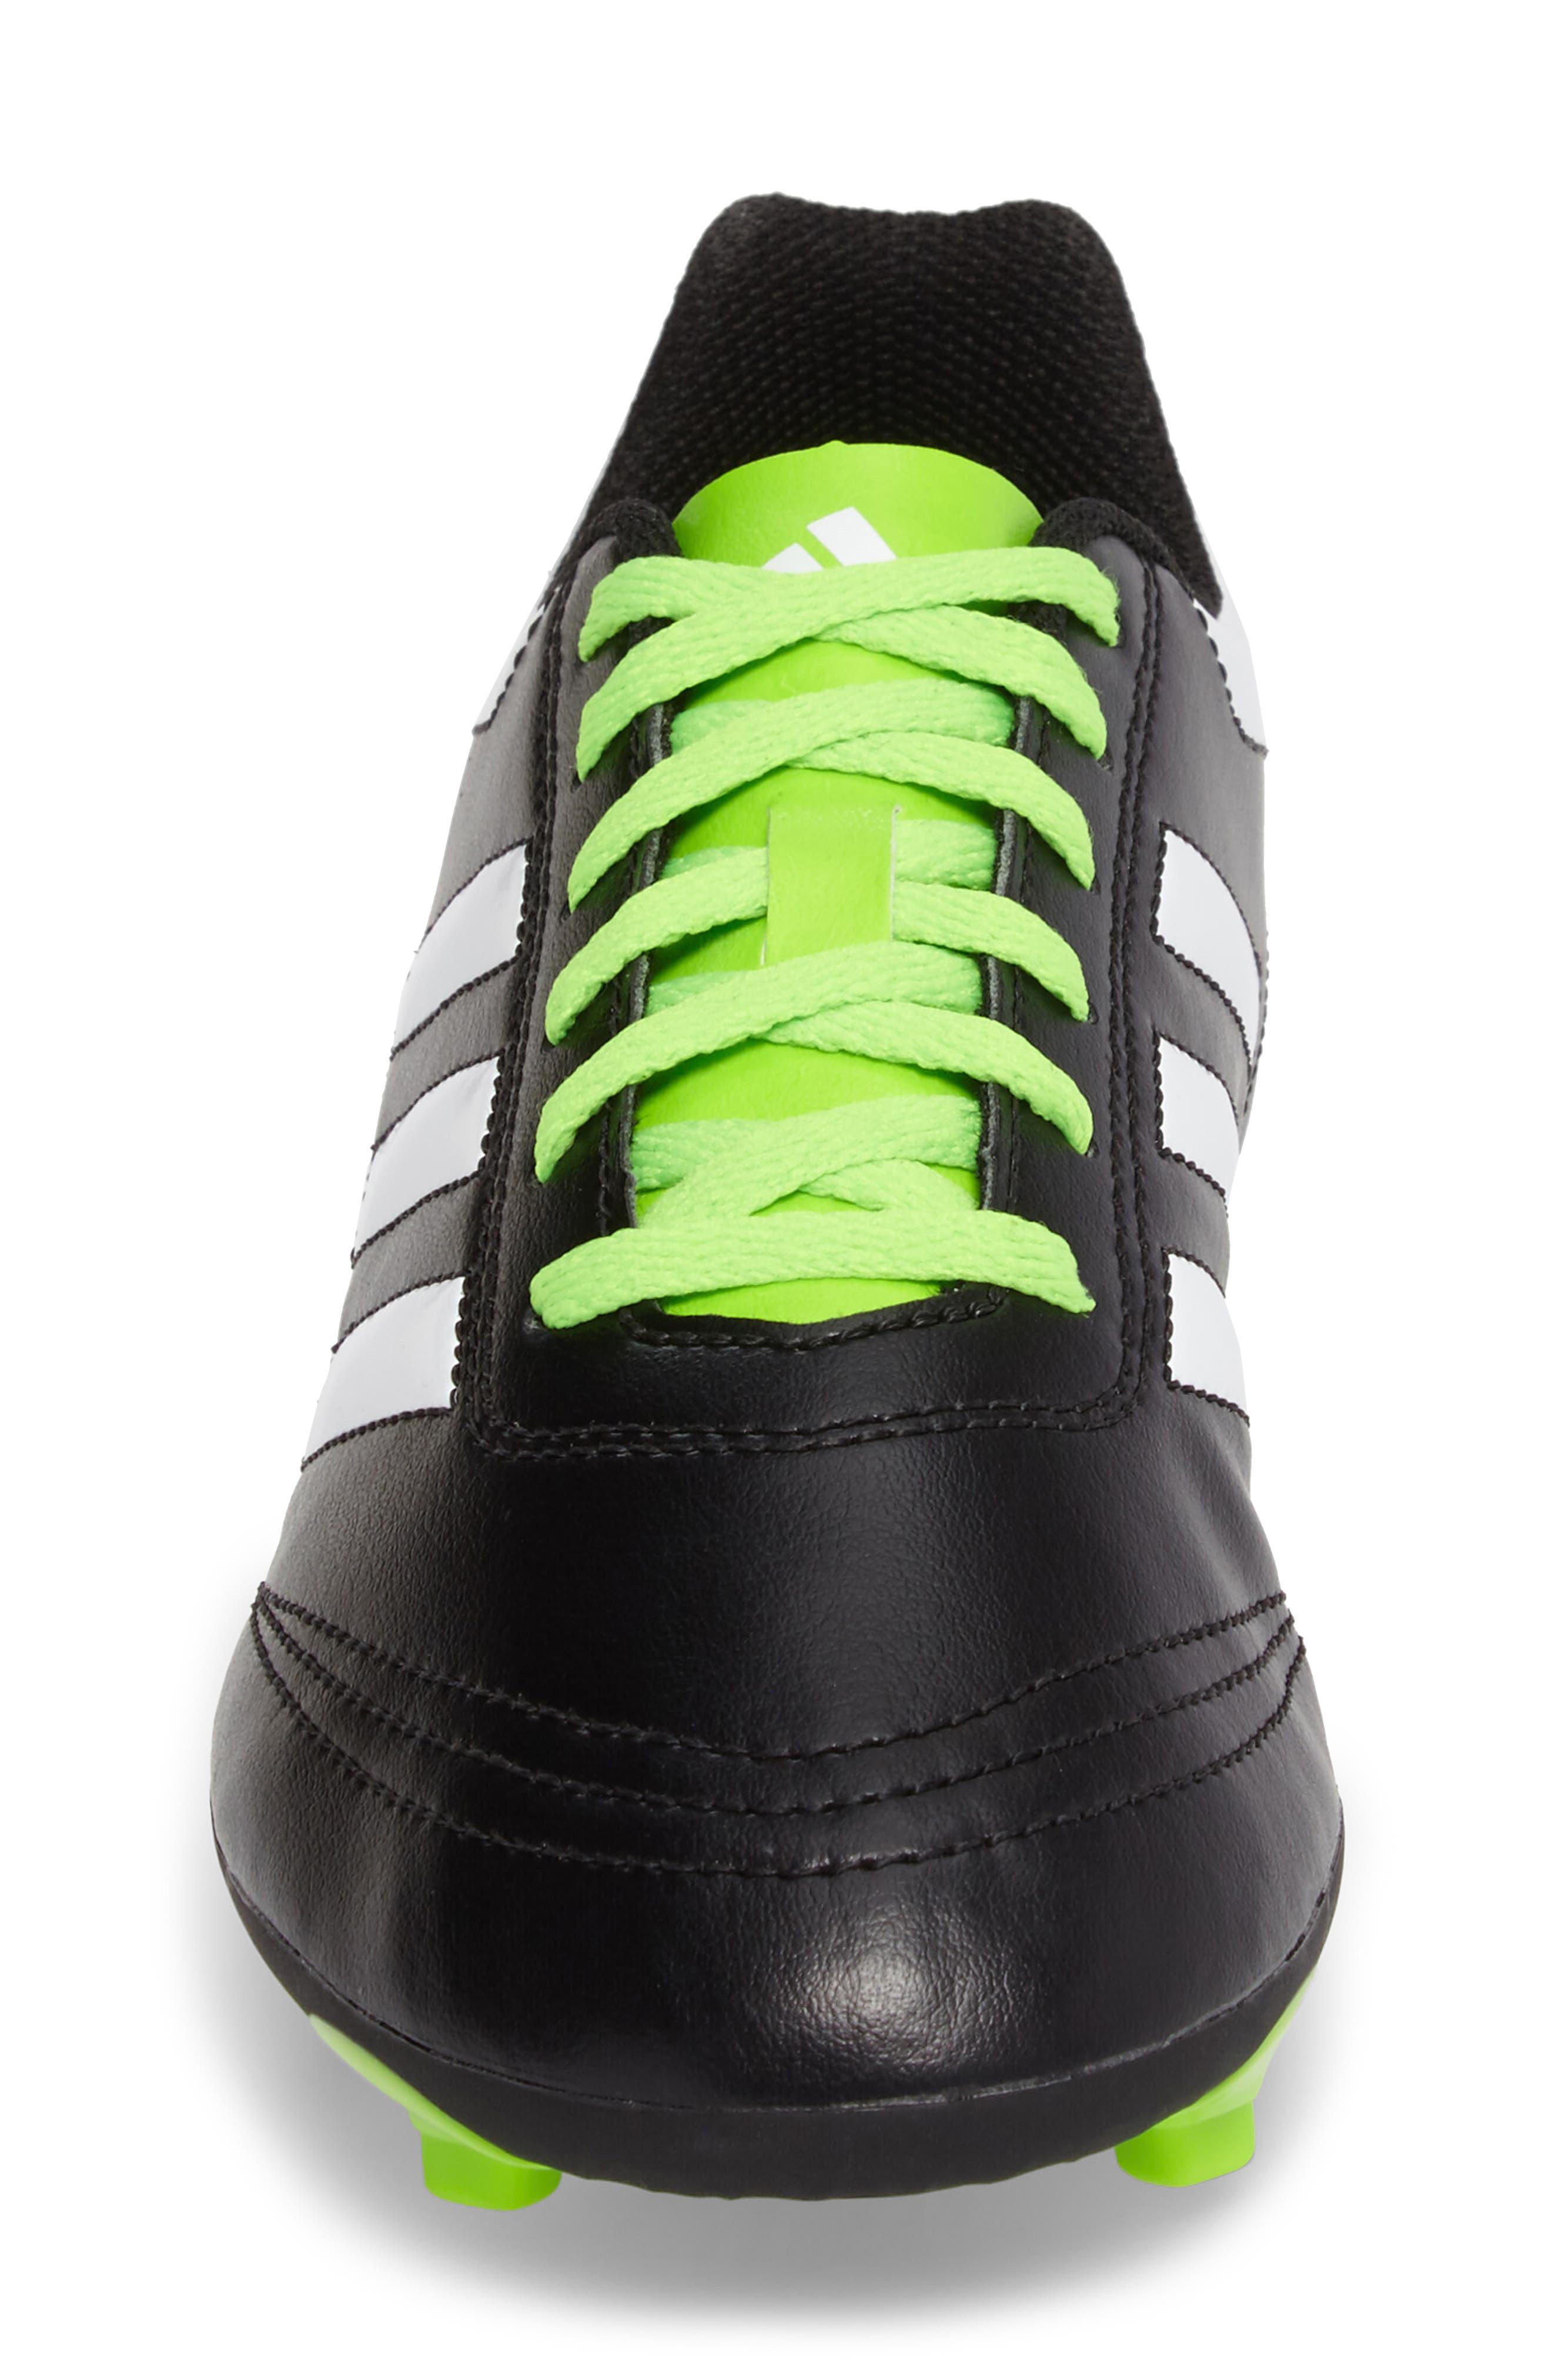 Alternate Image 4  - adidas Goletto VI Soccer Shoe (Toddler, Little Kid & Big Kid)